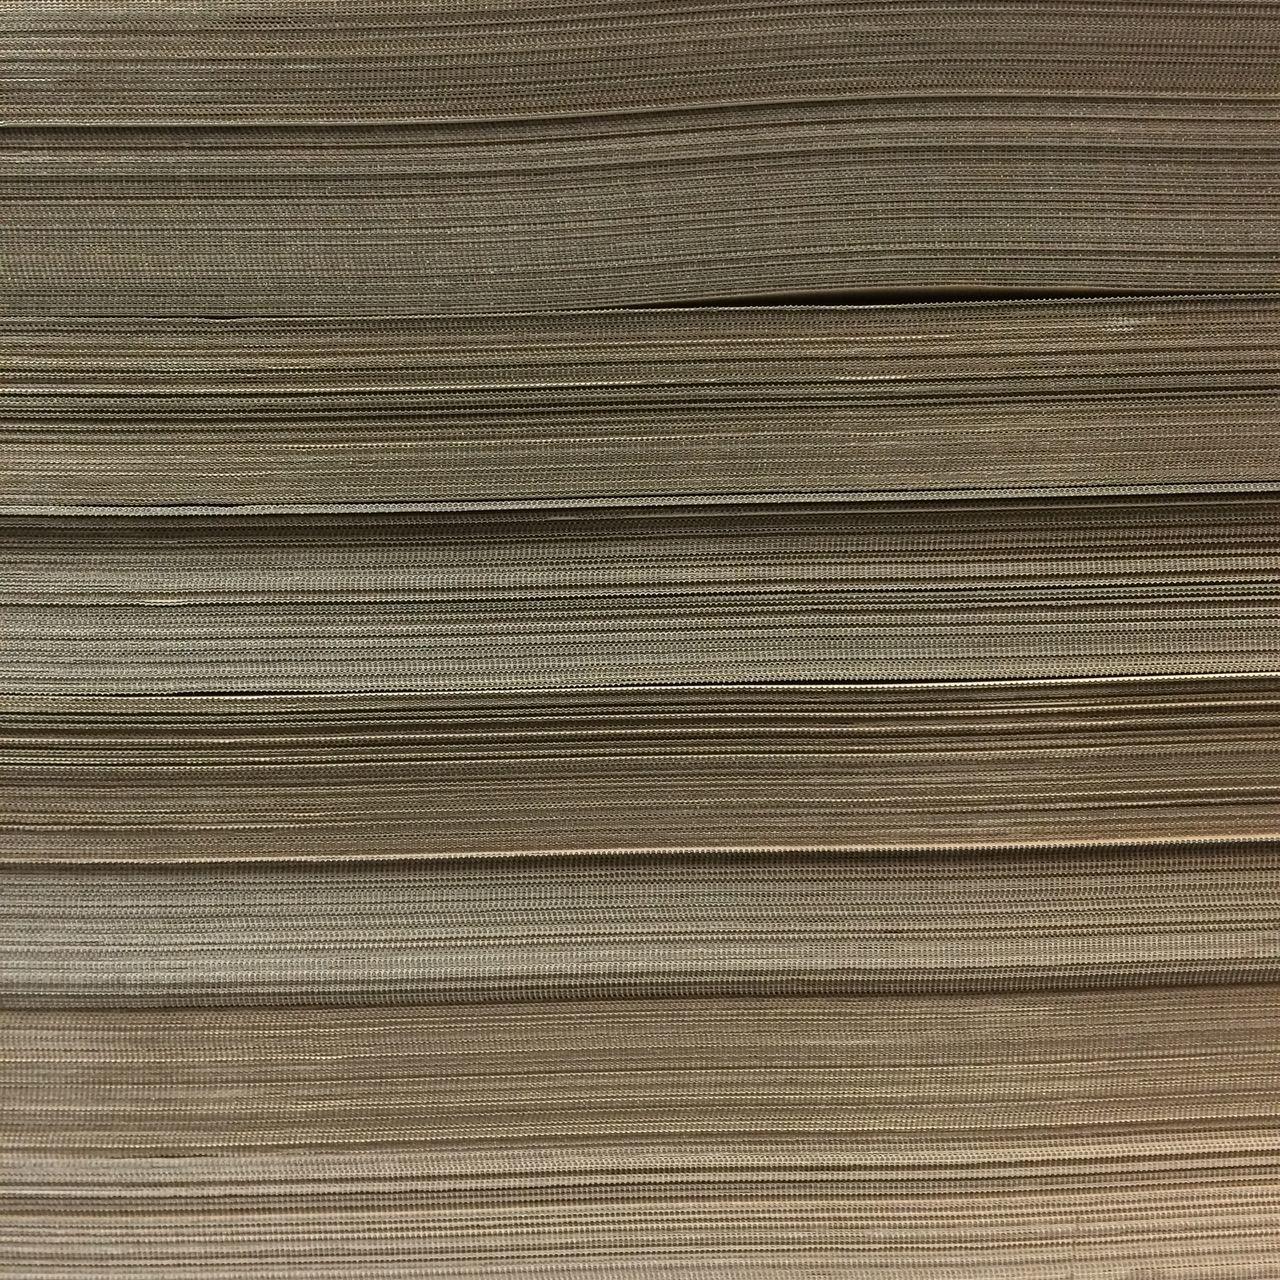 Horizontal Pattern Paper Texture Papercraft